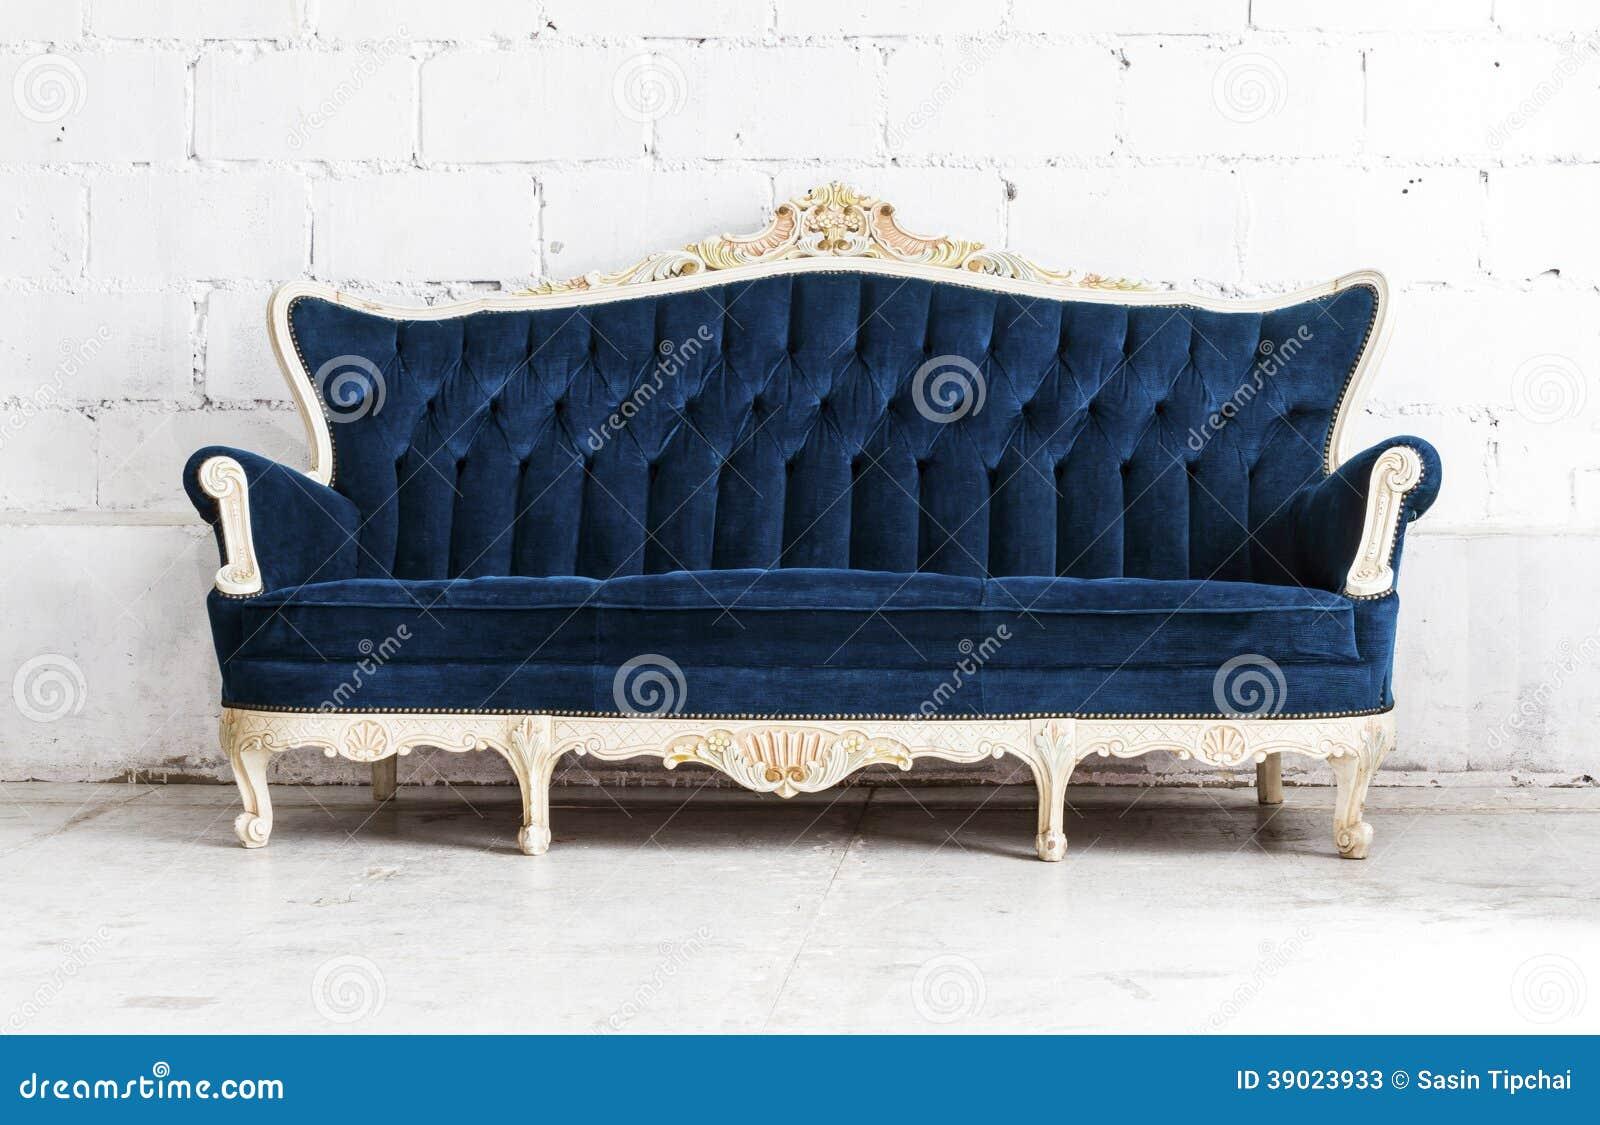 Divan classique bleu de sofa de style dans la chambre de for Vintage divan sofa